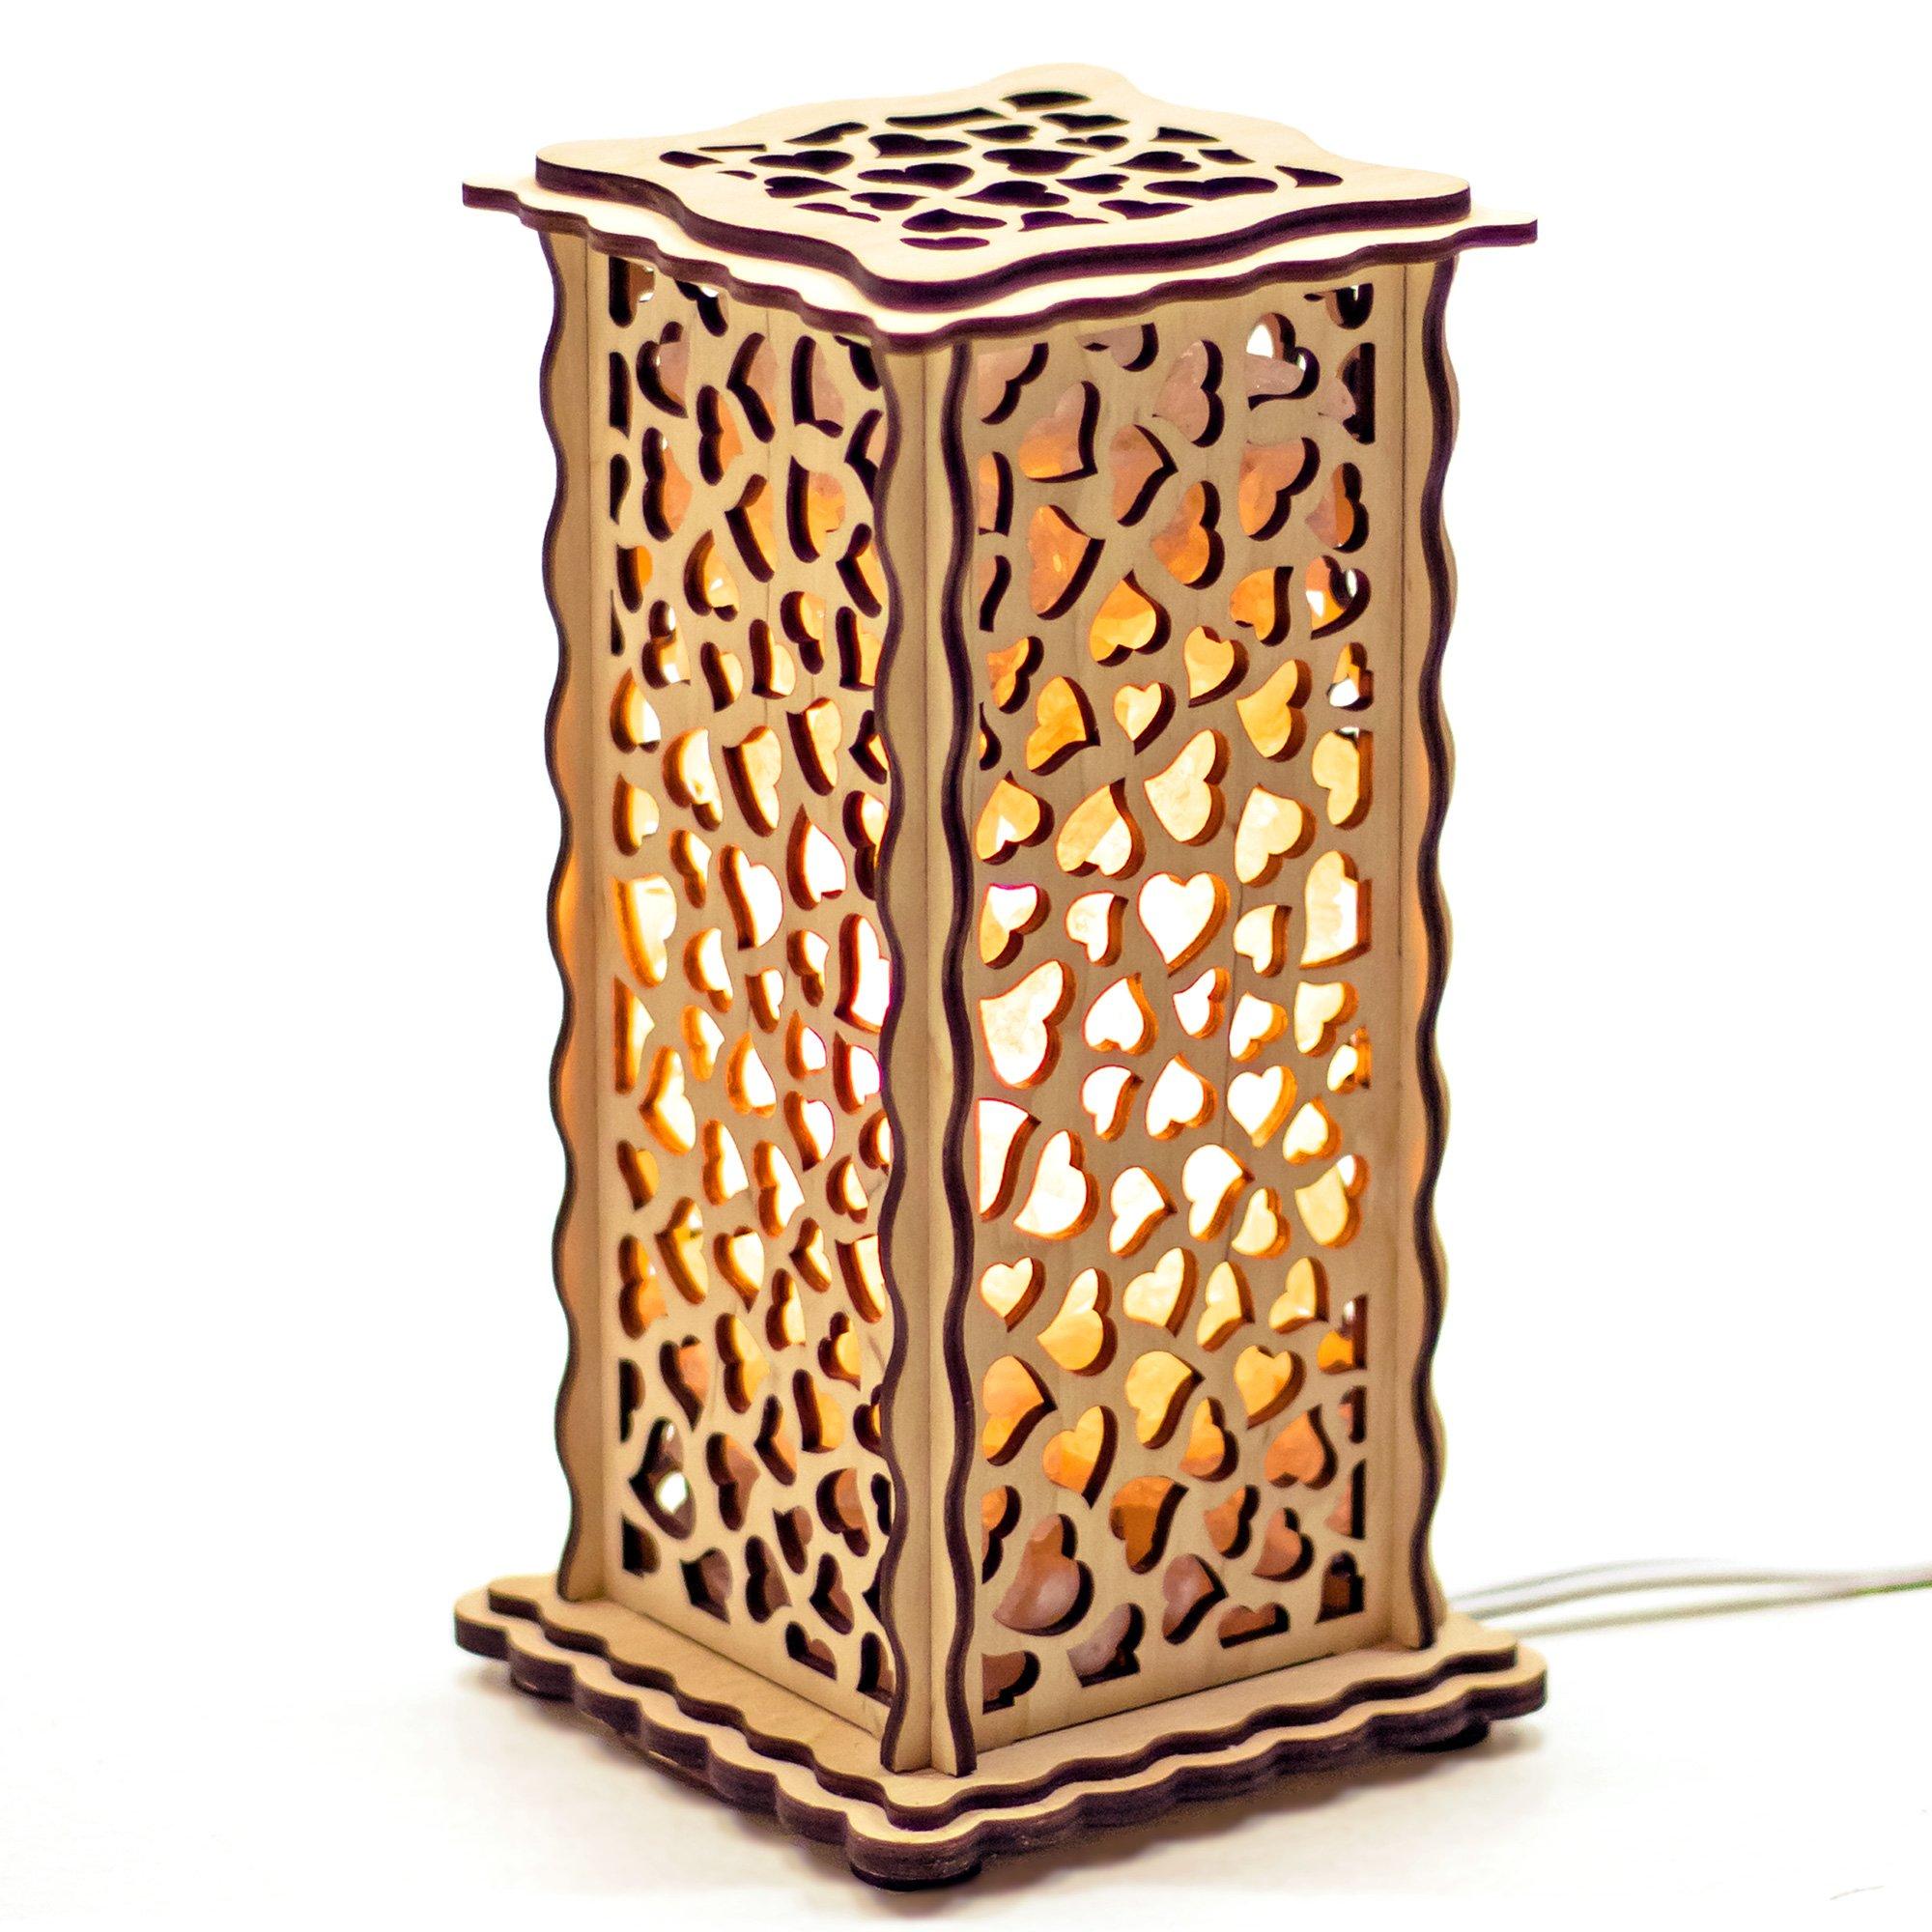 ARTSALT Salt Lamp «Hearts» – Natural Rock Salt lamp in Wooden Frame, air Purifying Salt Rocks (4 lbs), Bedroom Decoration nightlight, with dimmer Control in eco Craft Gift Box